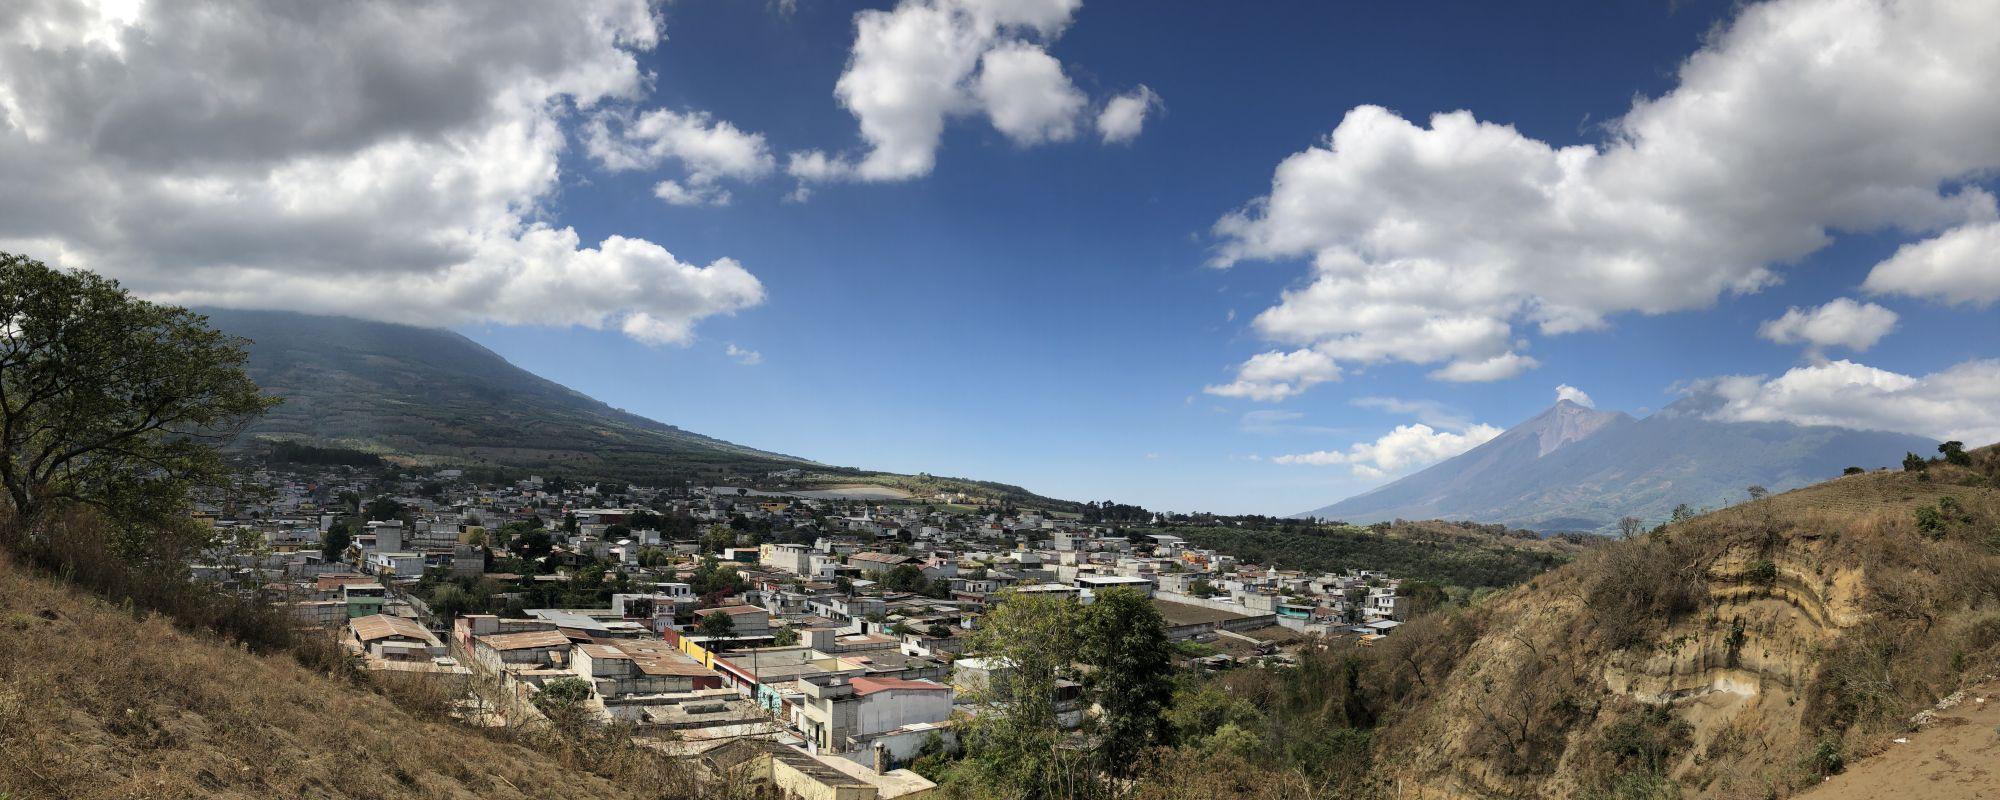 Distant image of Guatemala